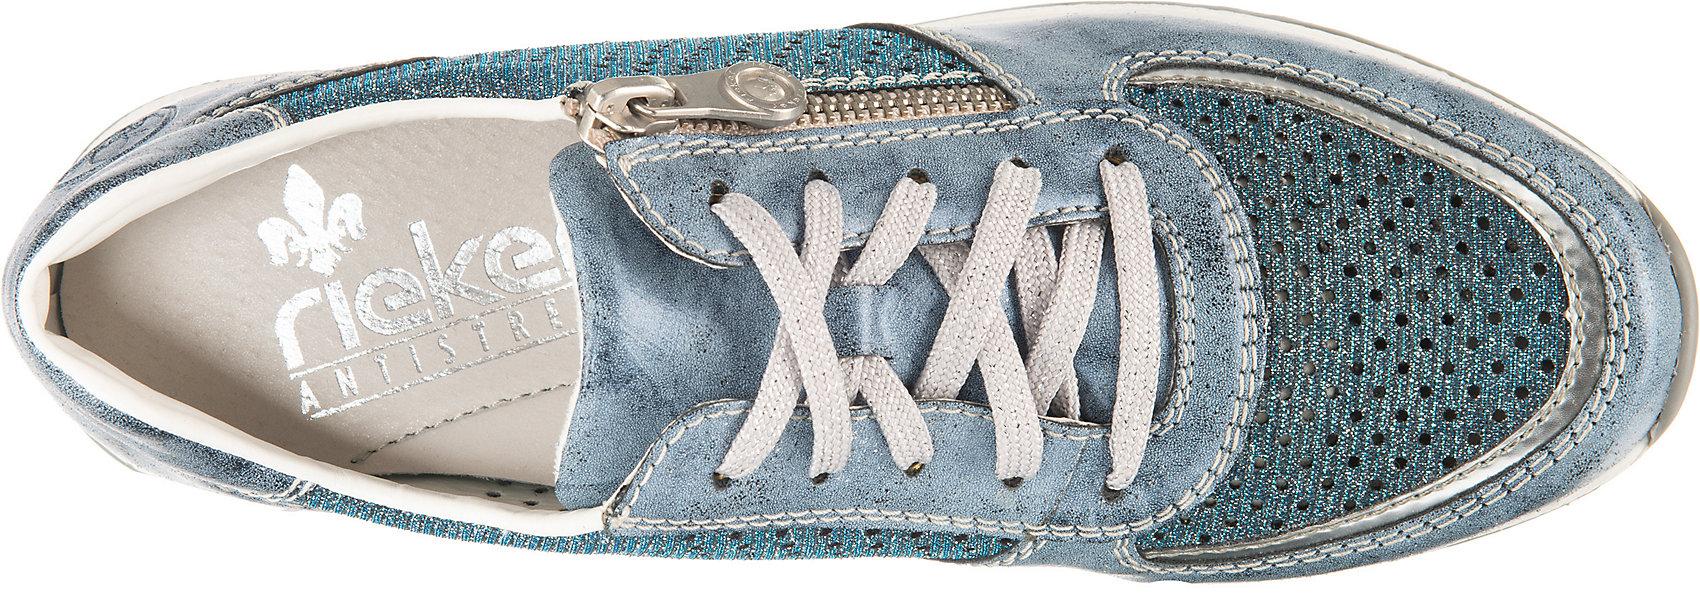 Neu rieker Sneakers Low 13411598 für Damen blau